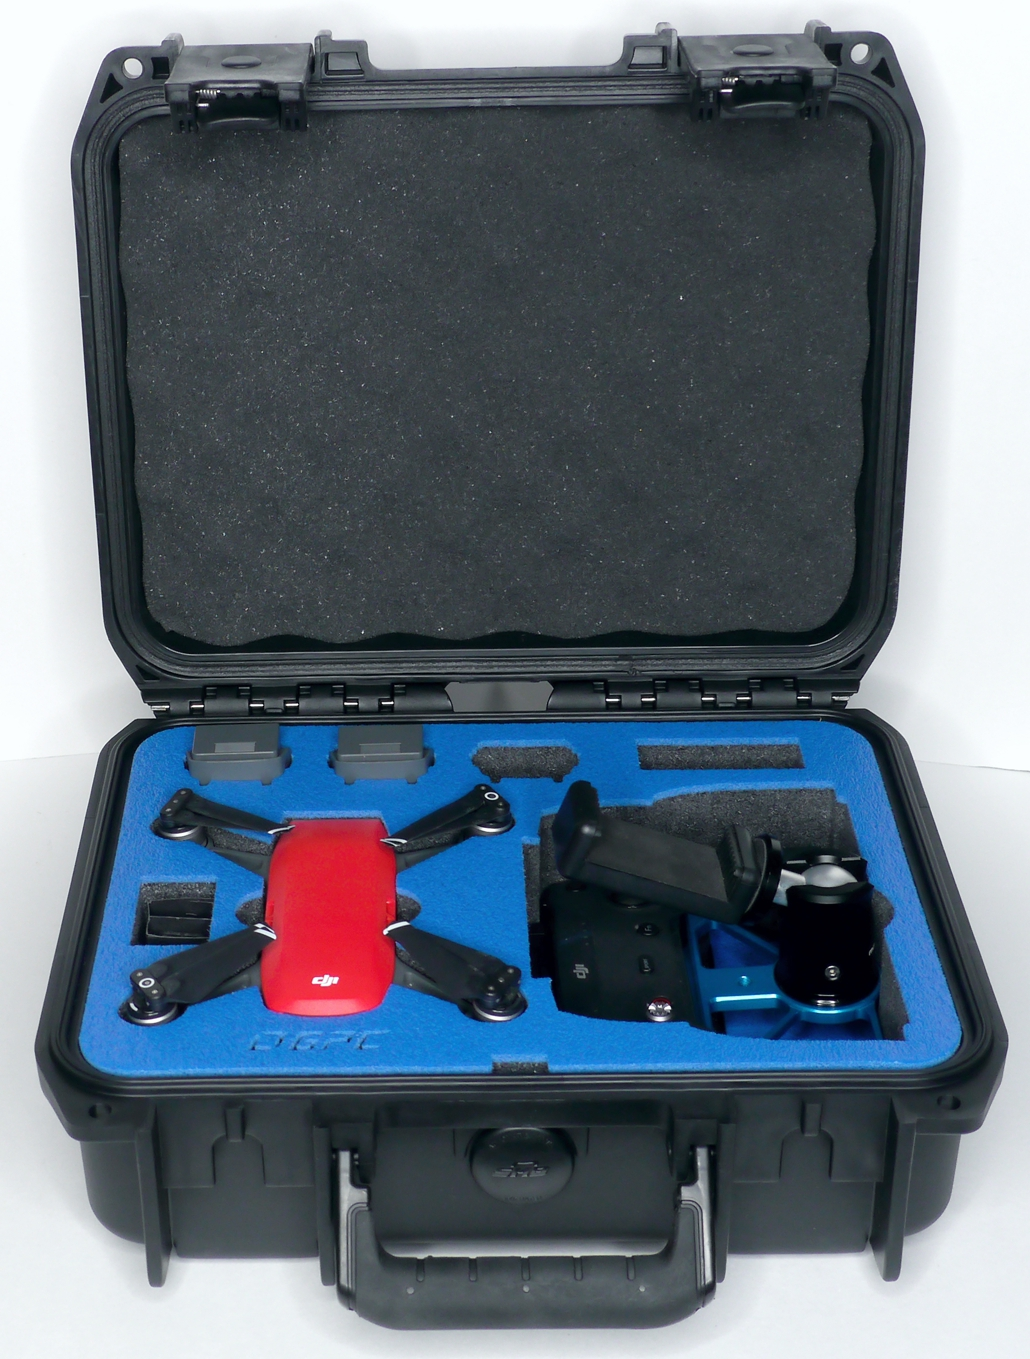 Uzopi Mavic Dji Spark Accessories Bundle Set Combo Gimbal Guard Cap Cover Camera All Sensor Landing Gear Sun Shade